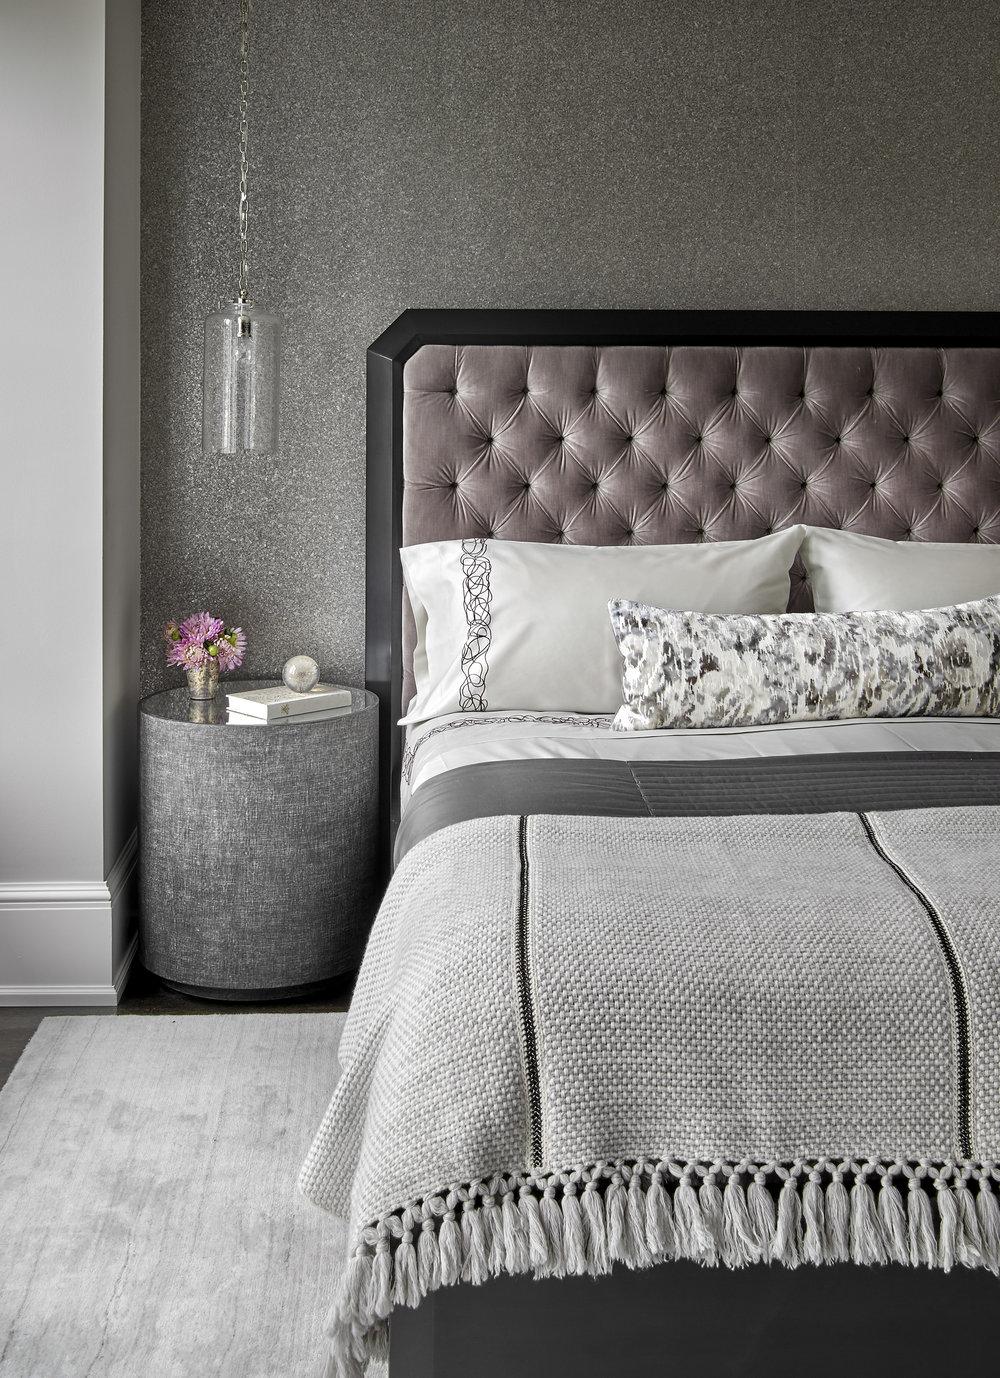 demetrio_mohawk_master bedroom.jpg